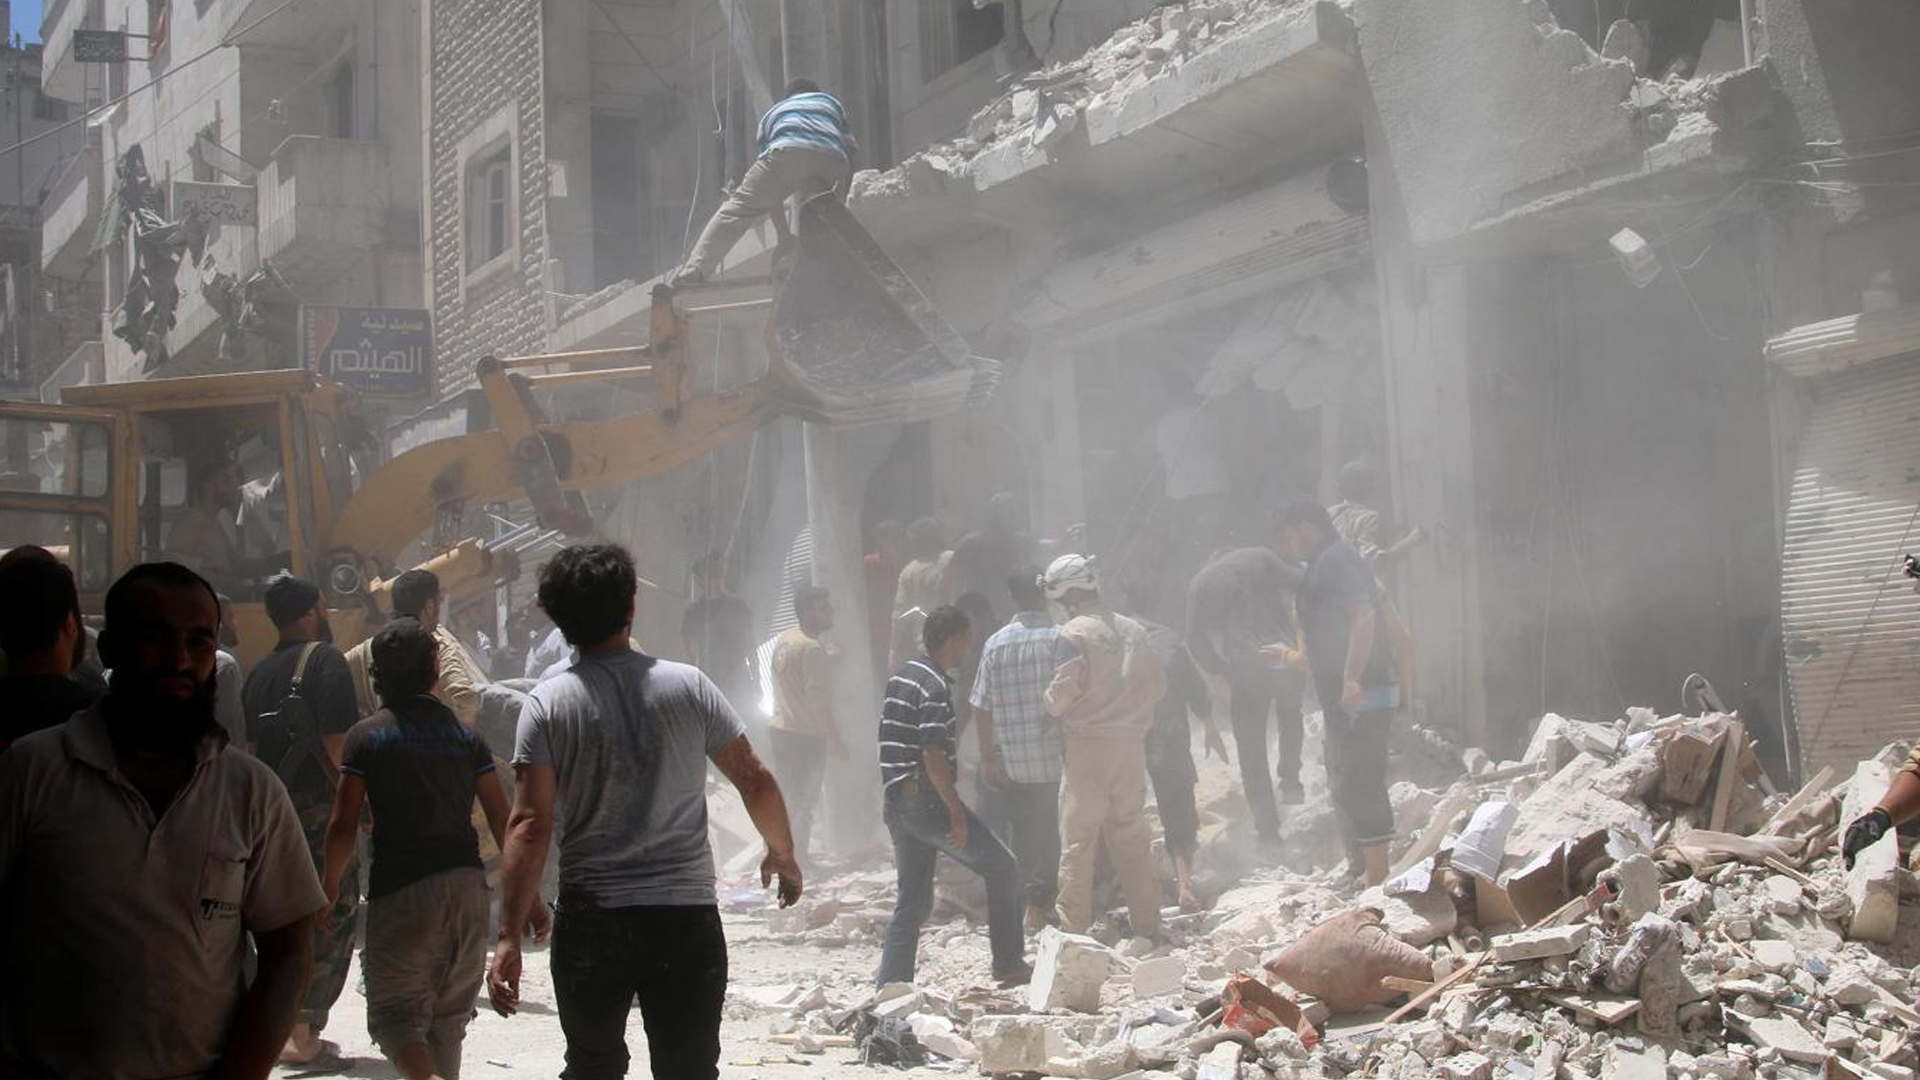 Rusya, İdlib'e bomba yağdırdı: 9 sivil ölü, 10 yaralı